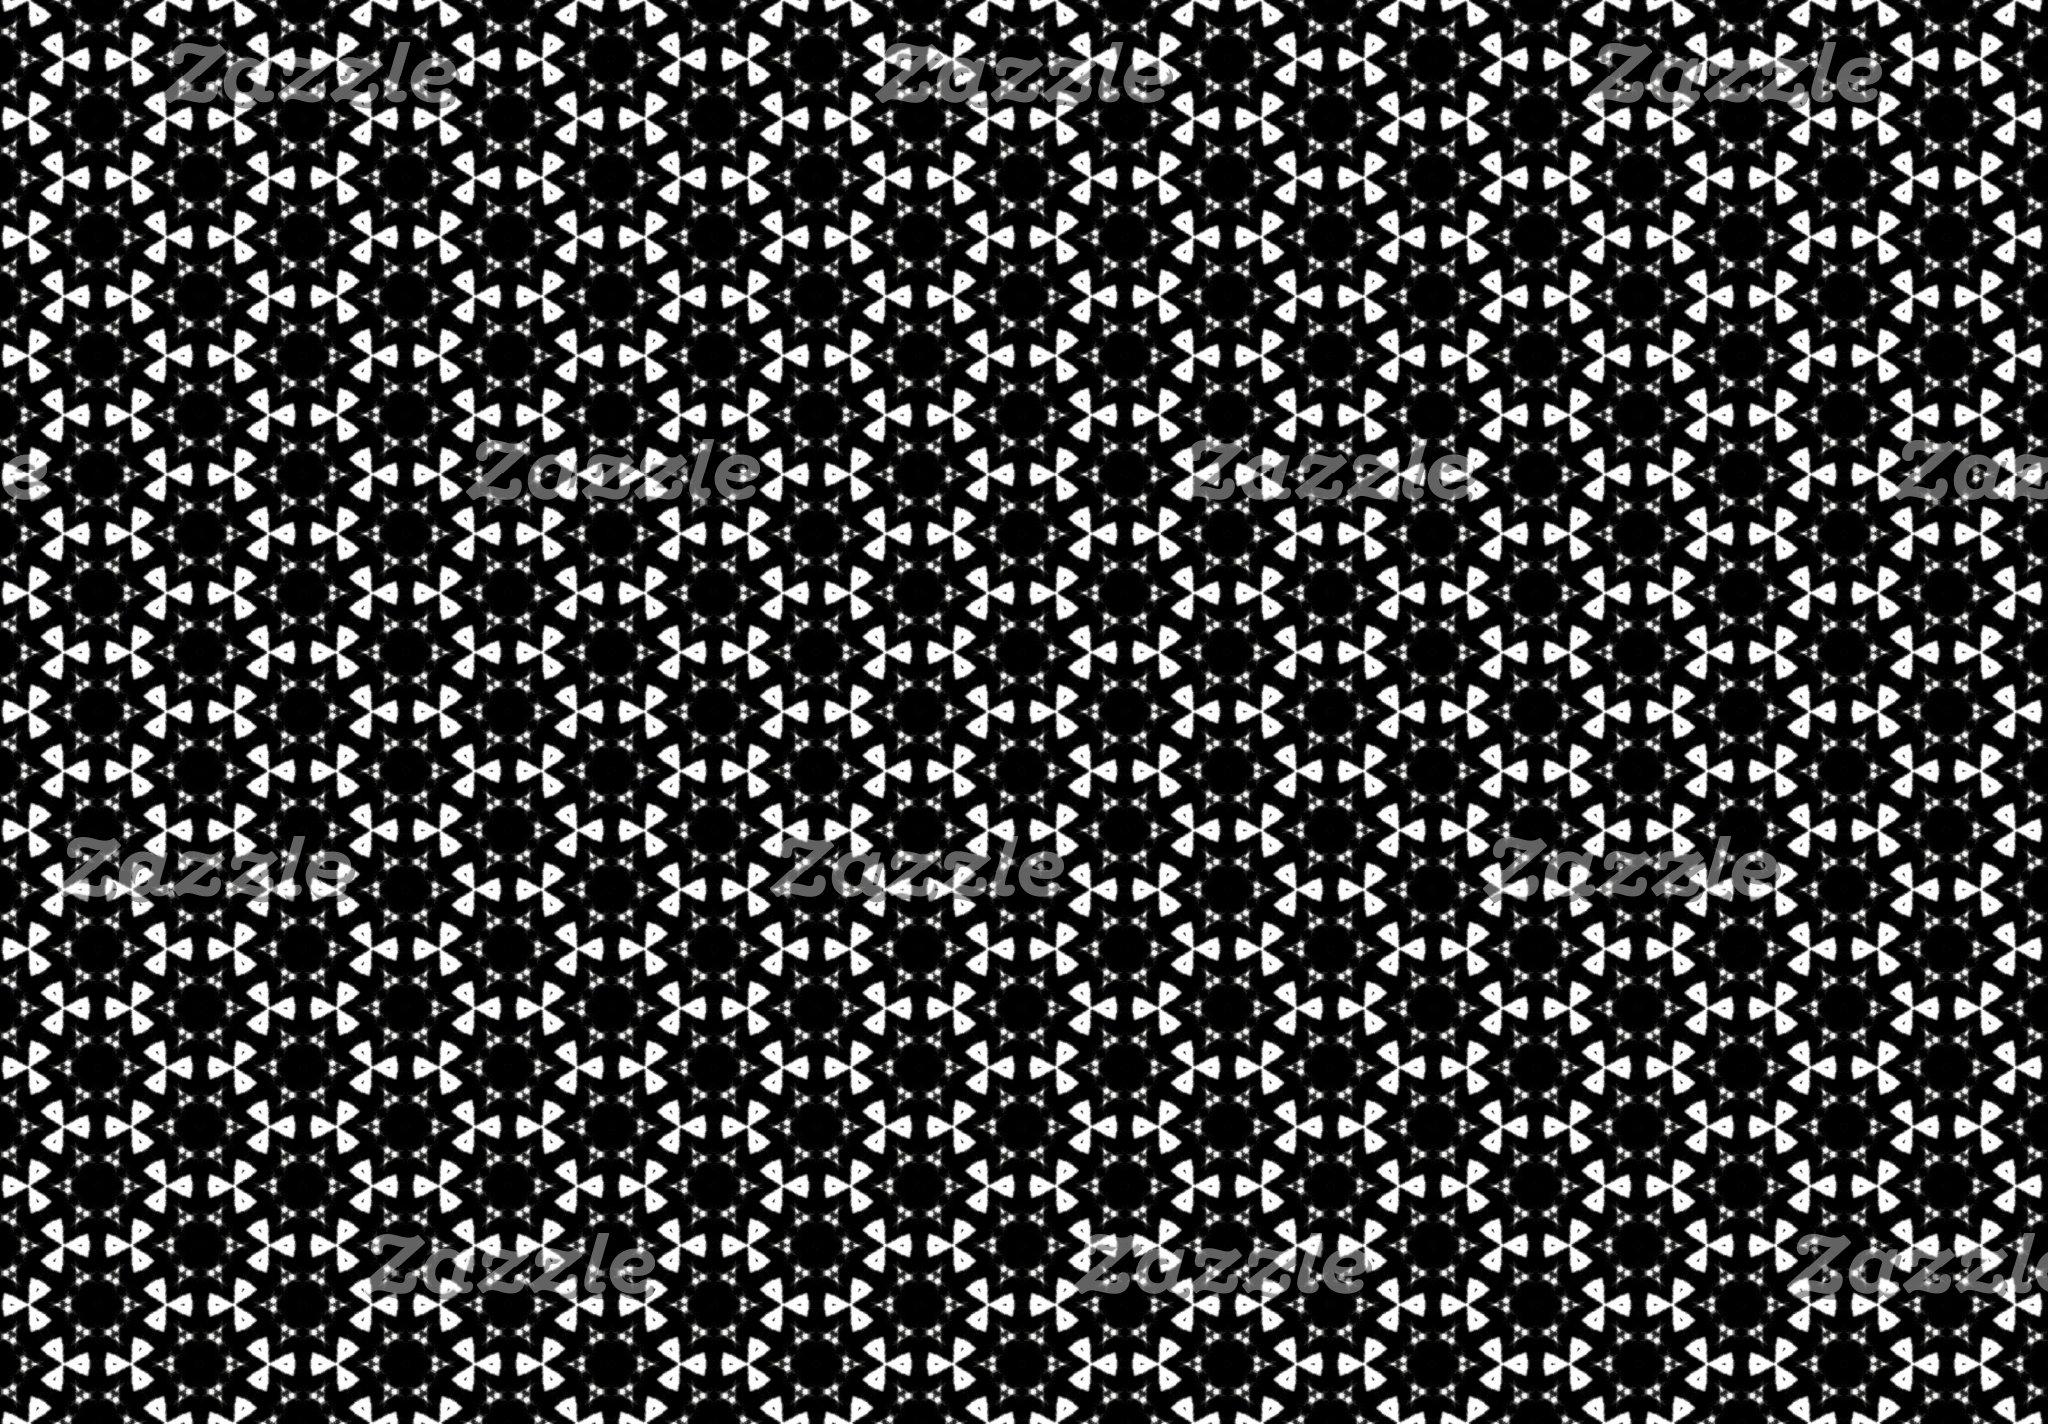 Black & White Patterns | Hexagons I